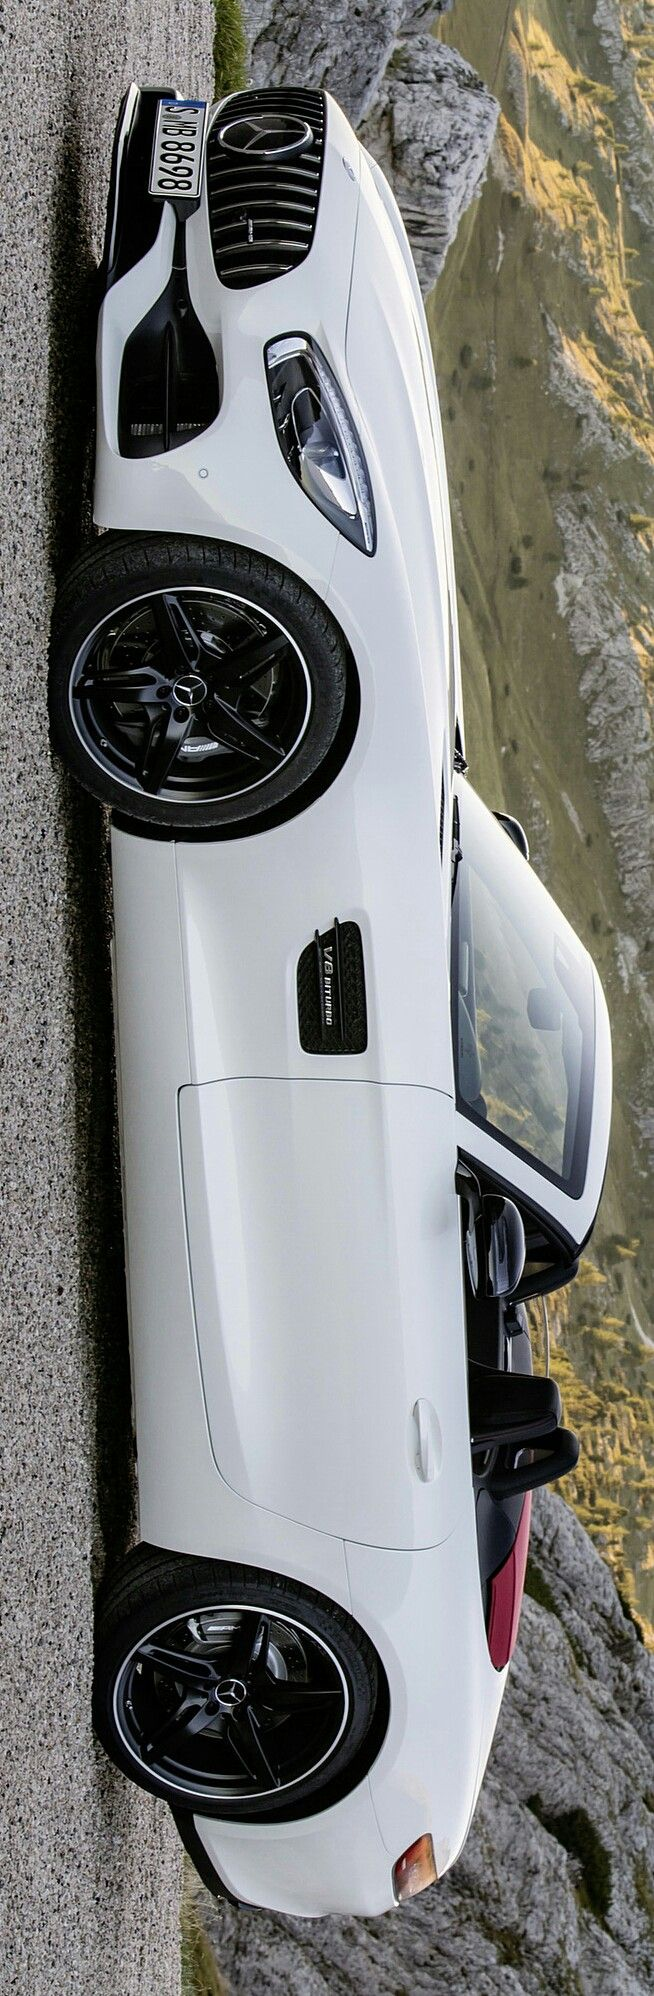 2018 Mercedes-AMG GT C Roadster by Levon